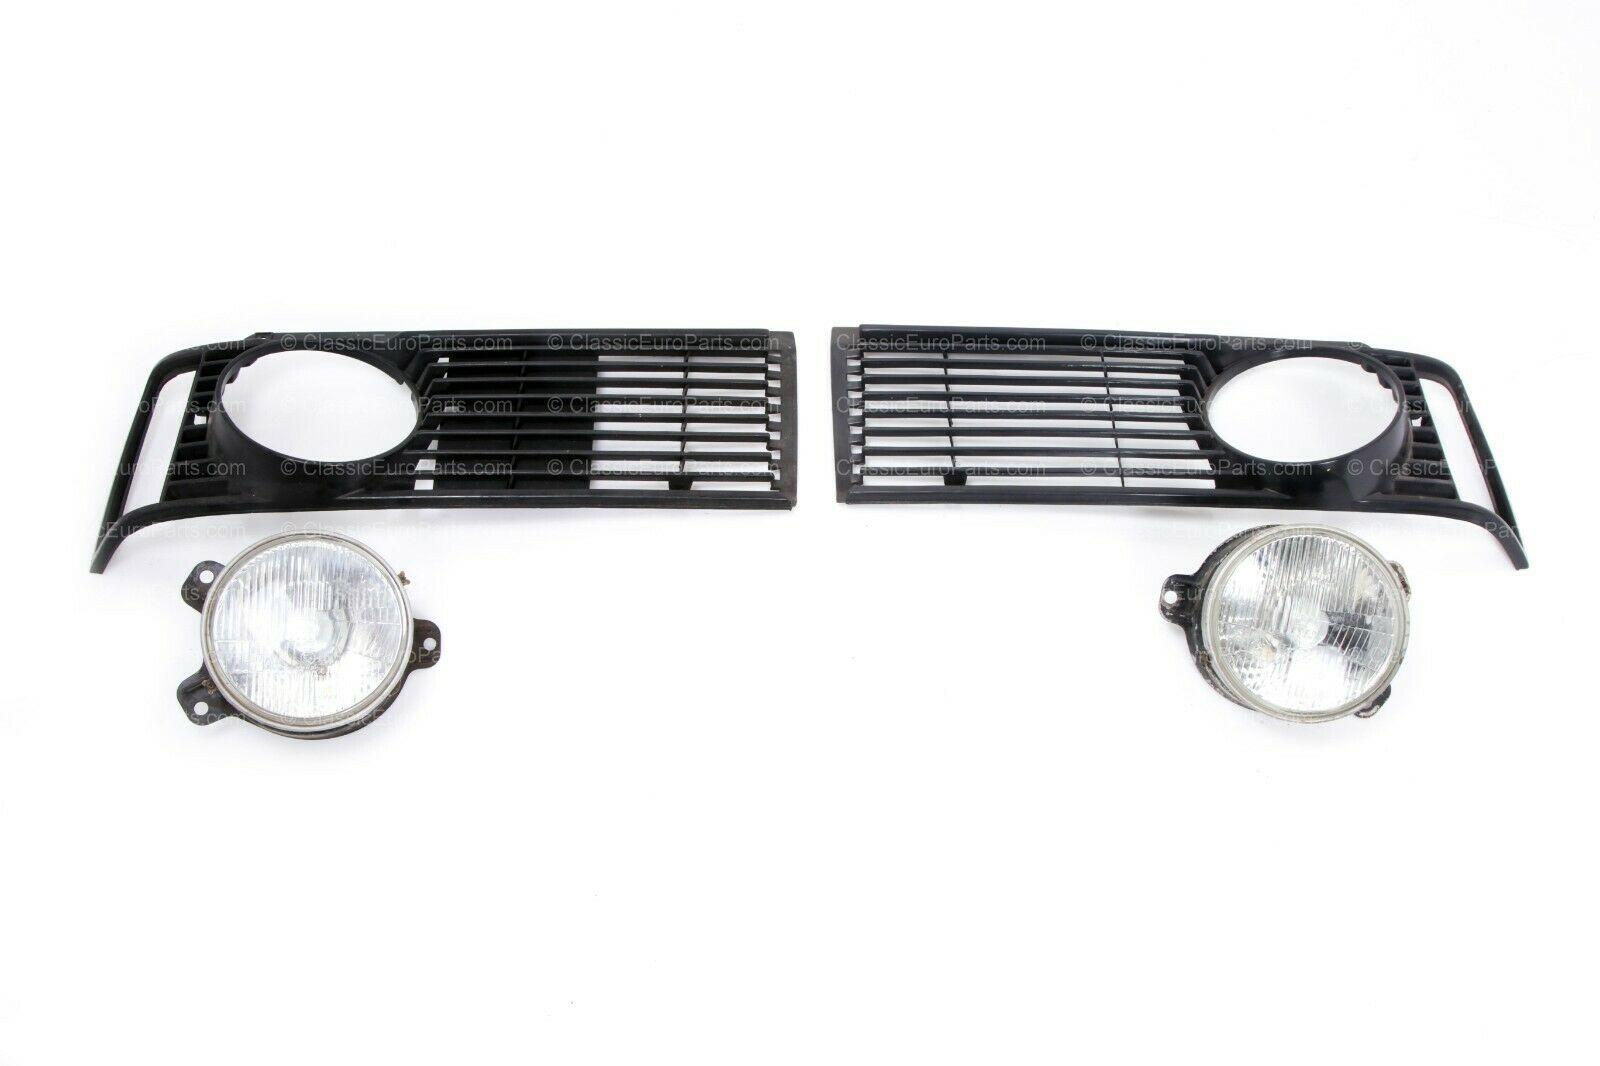 Euro Single Headlight Grill Set For E21 Used Lights Nos